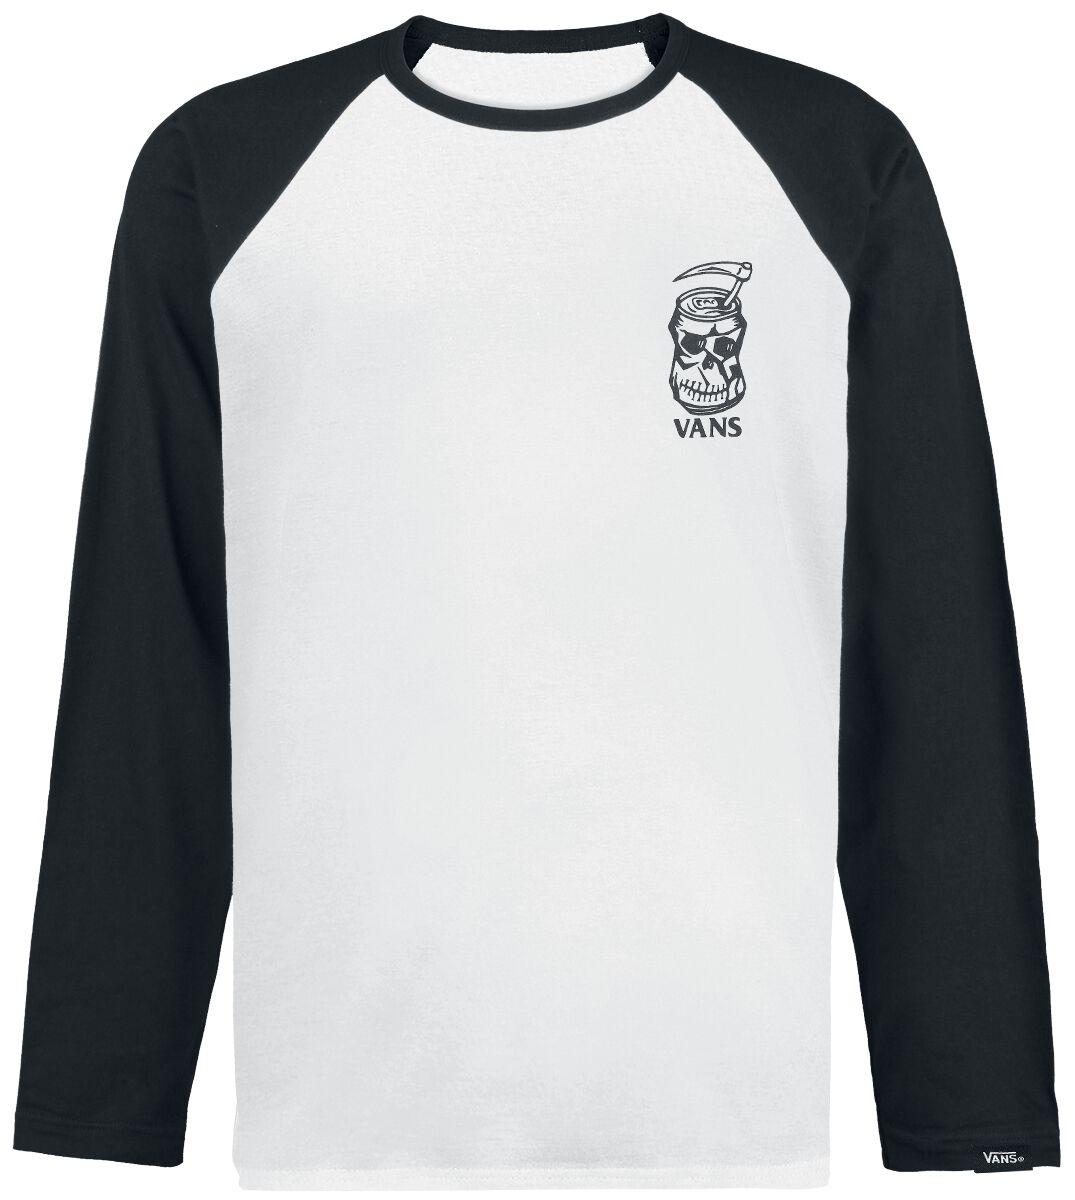 ad2c3e8bf Moonshine Raglan | Vans Long-sleeve Shirt | EMP